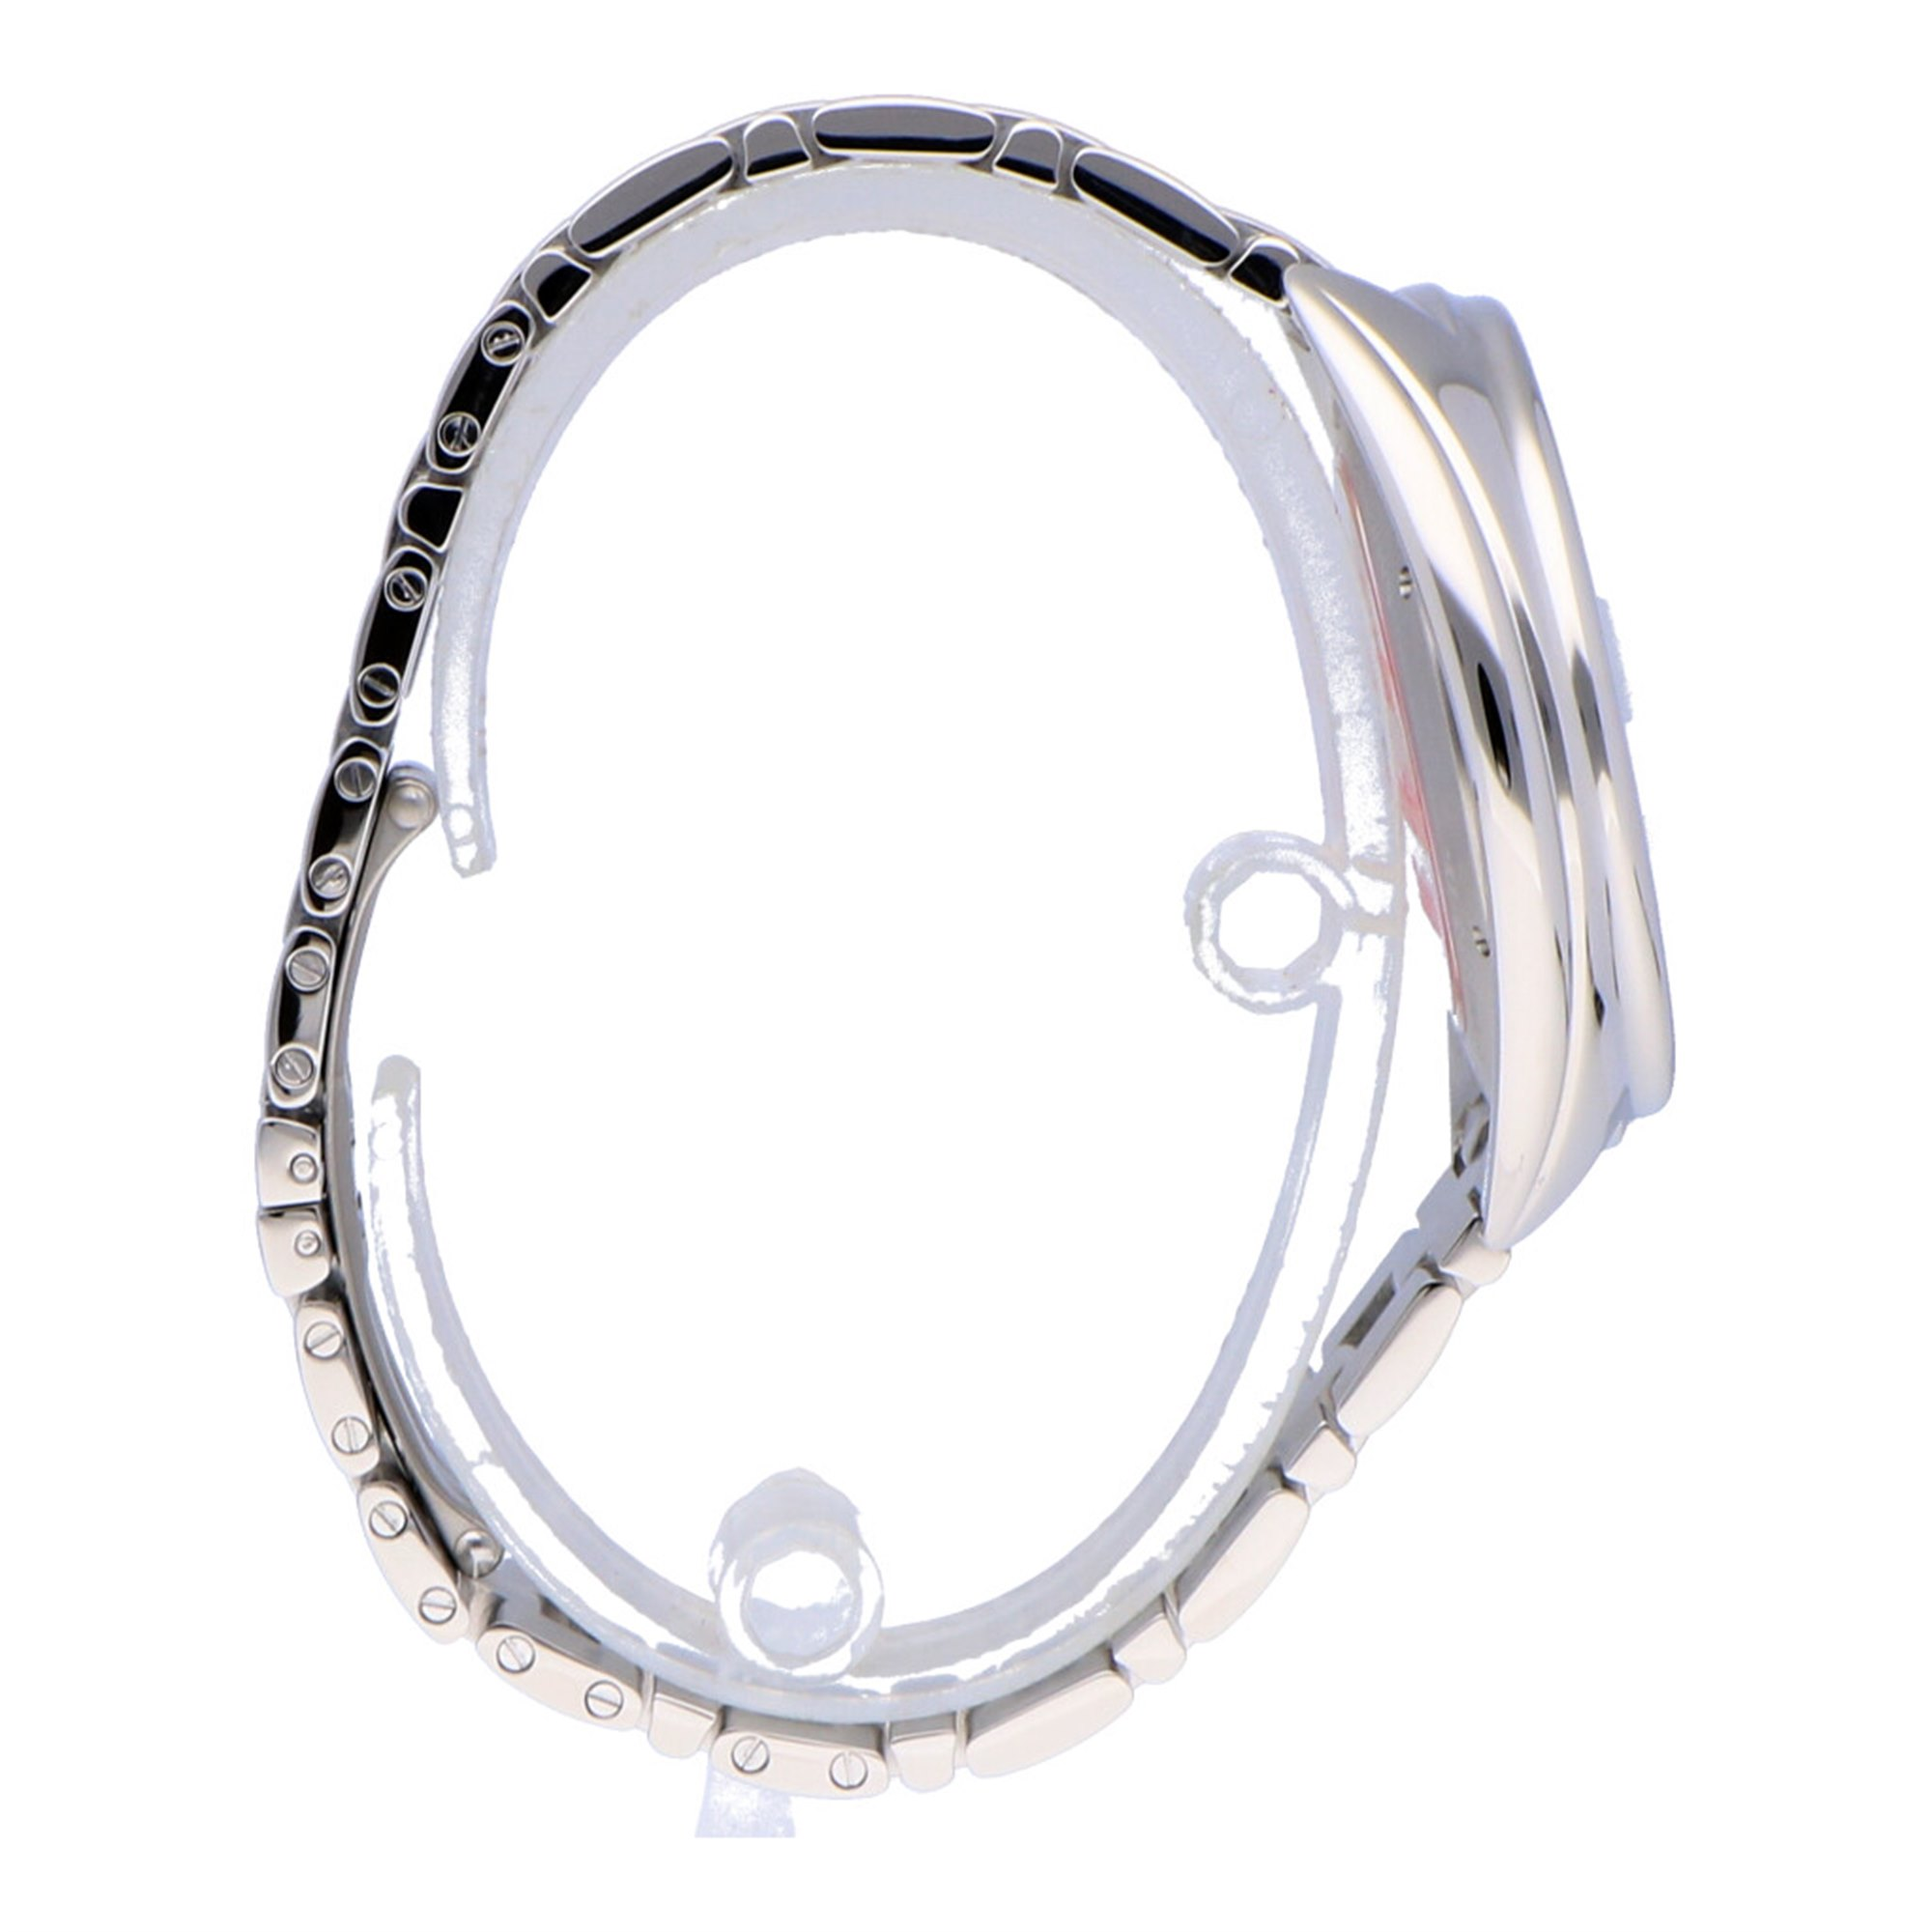 Cartier Clé de Cartier Stainless Steel WSCL0007